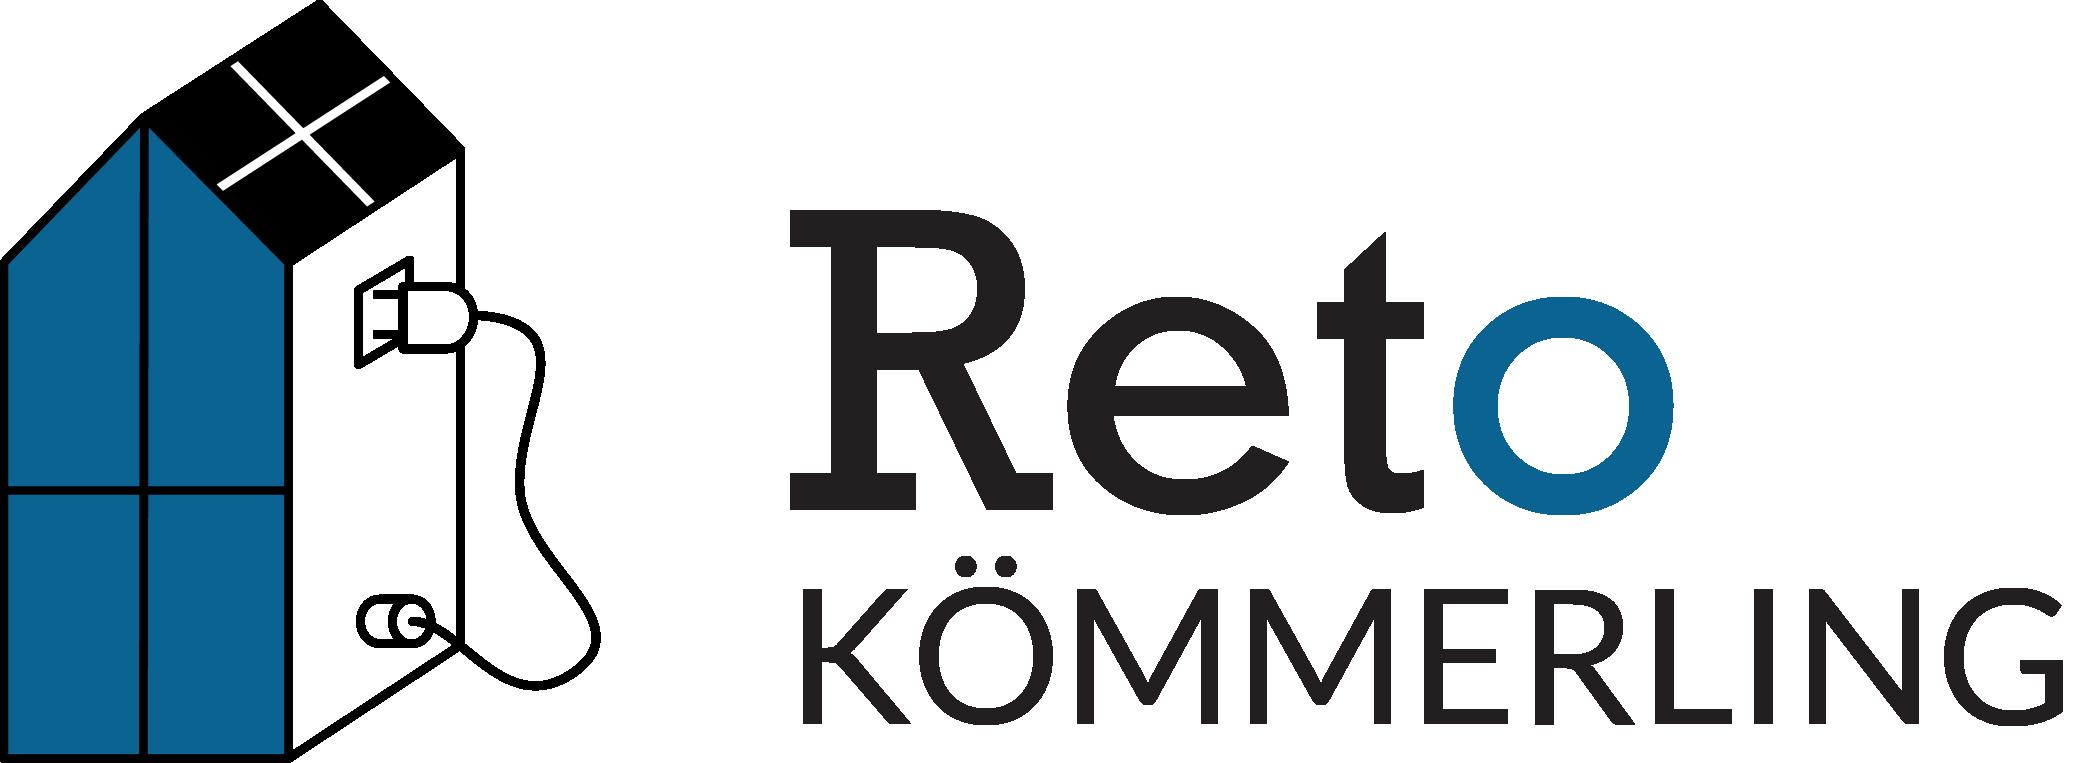 Logo Reto KOMMERLINGpng